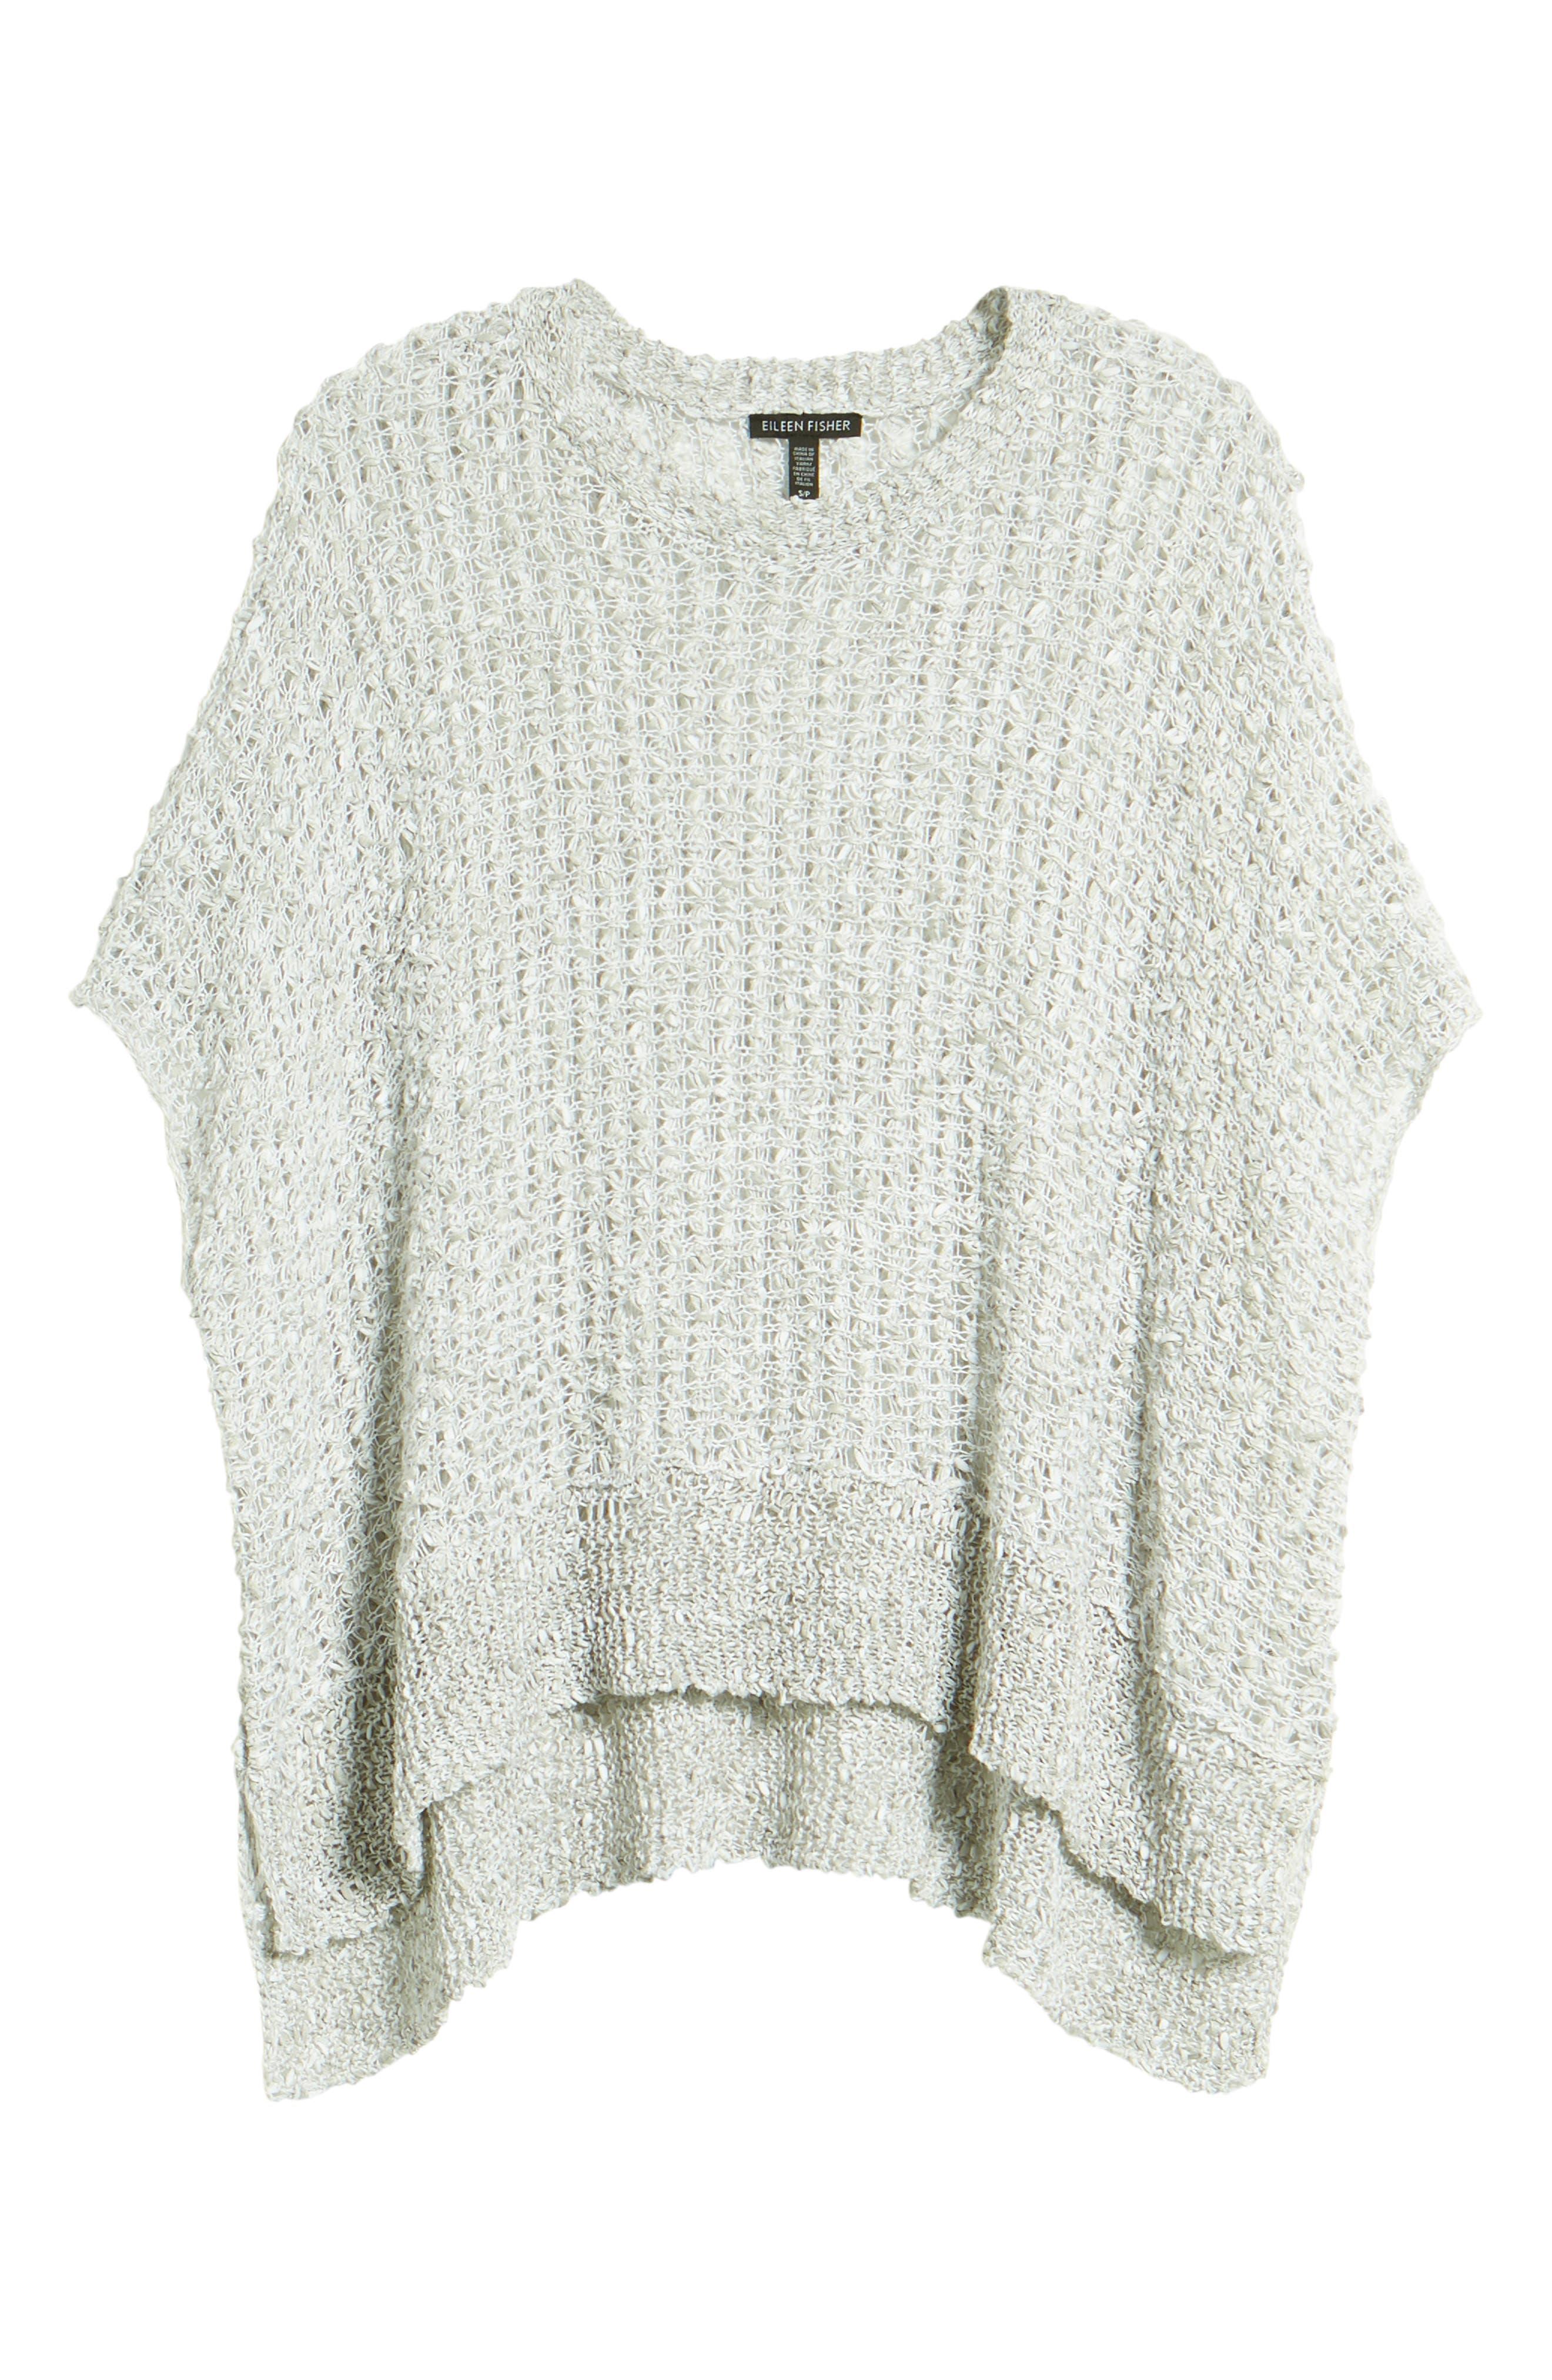 Organic Cotton & Linen Crochet Top,                             Alternate thumbnail 7, color,                             Dark Pearl